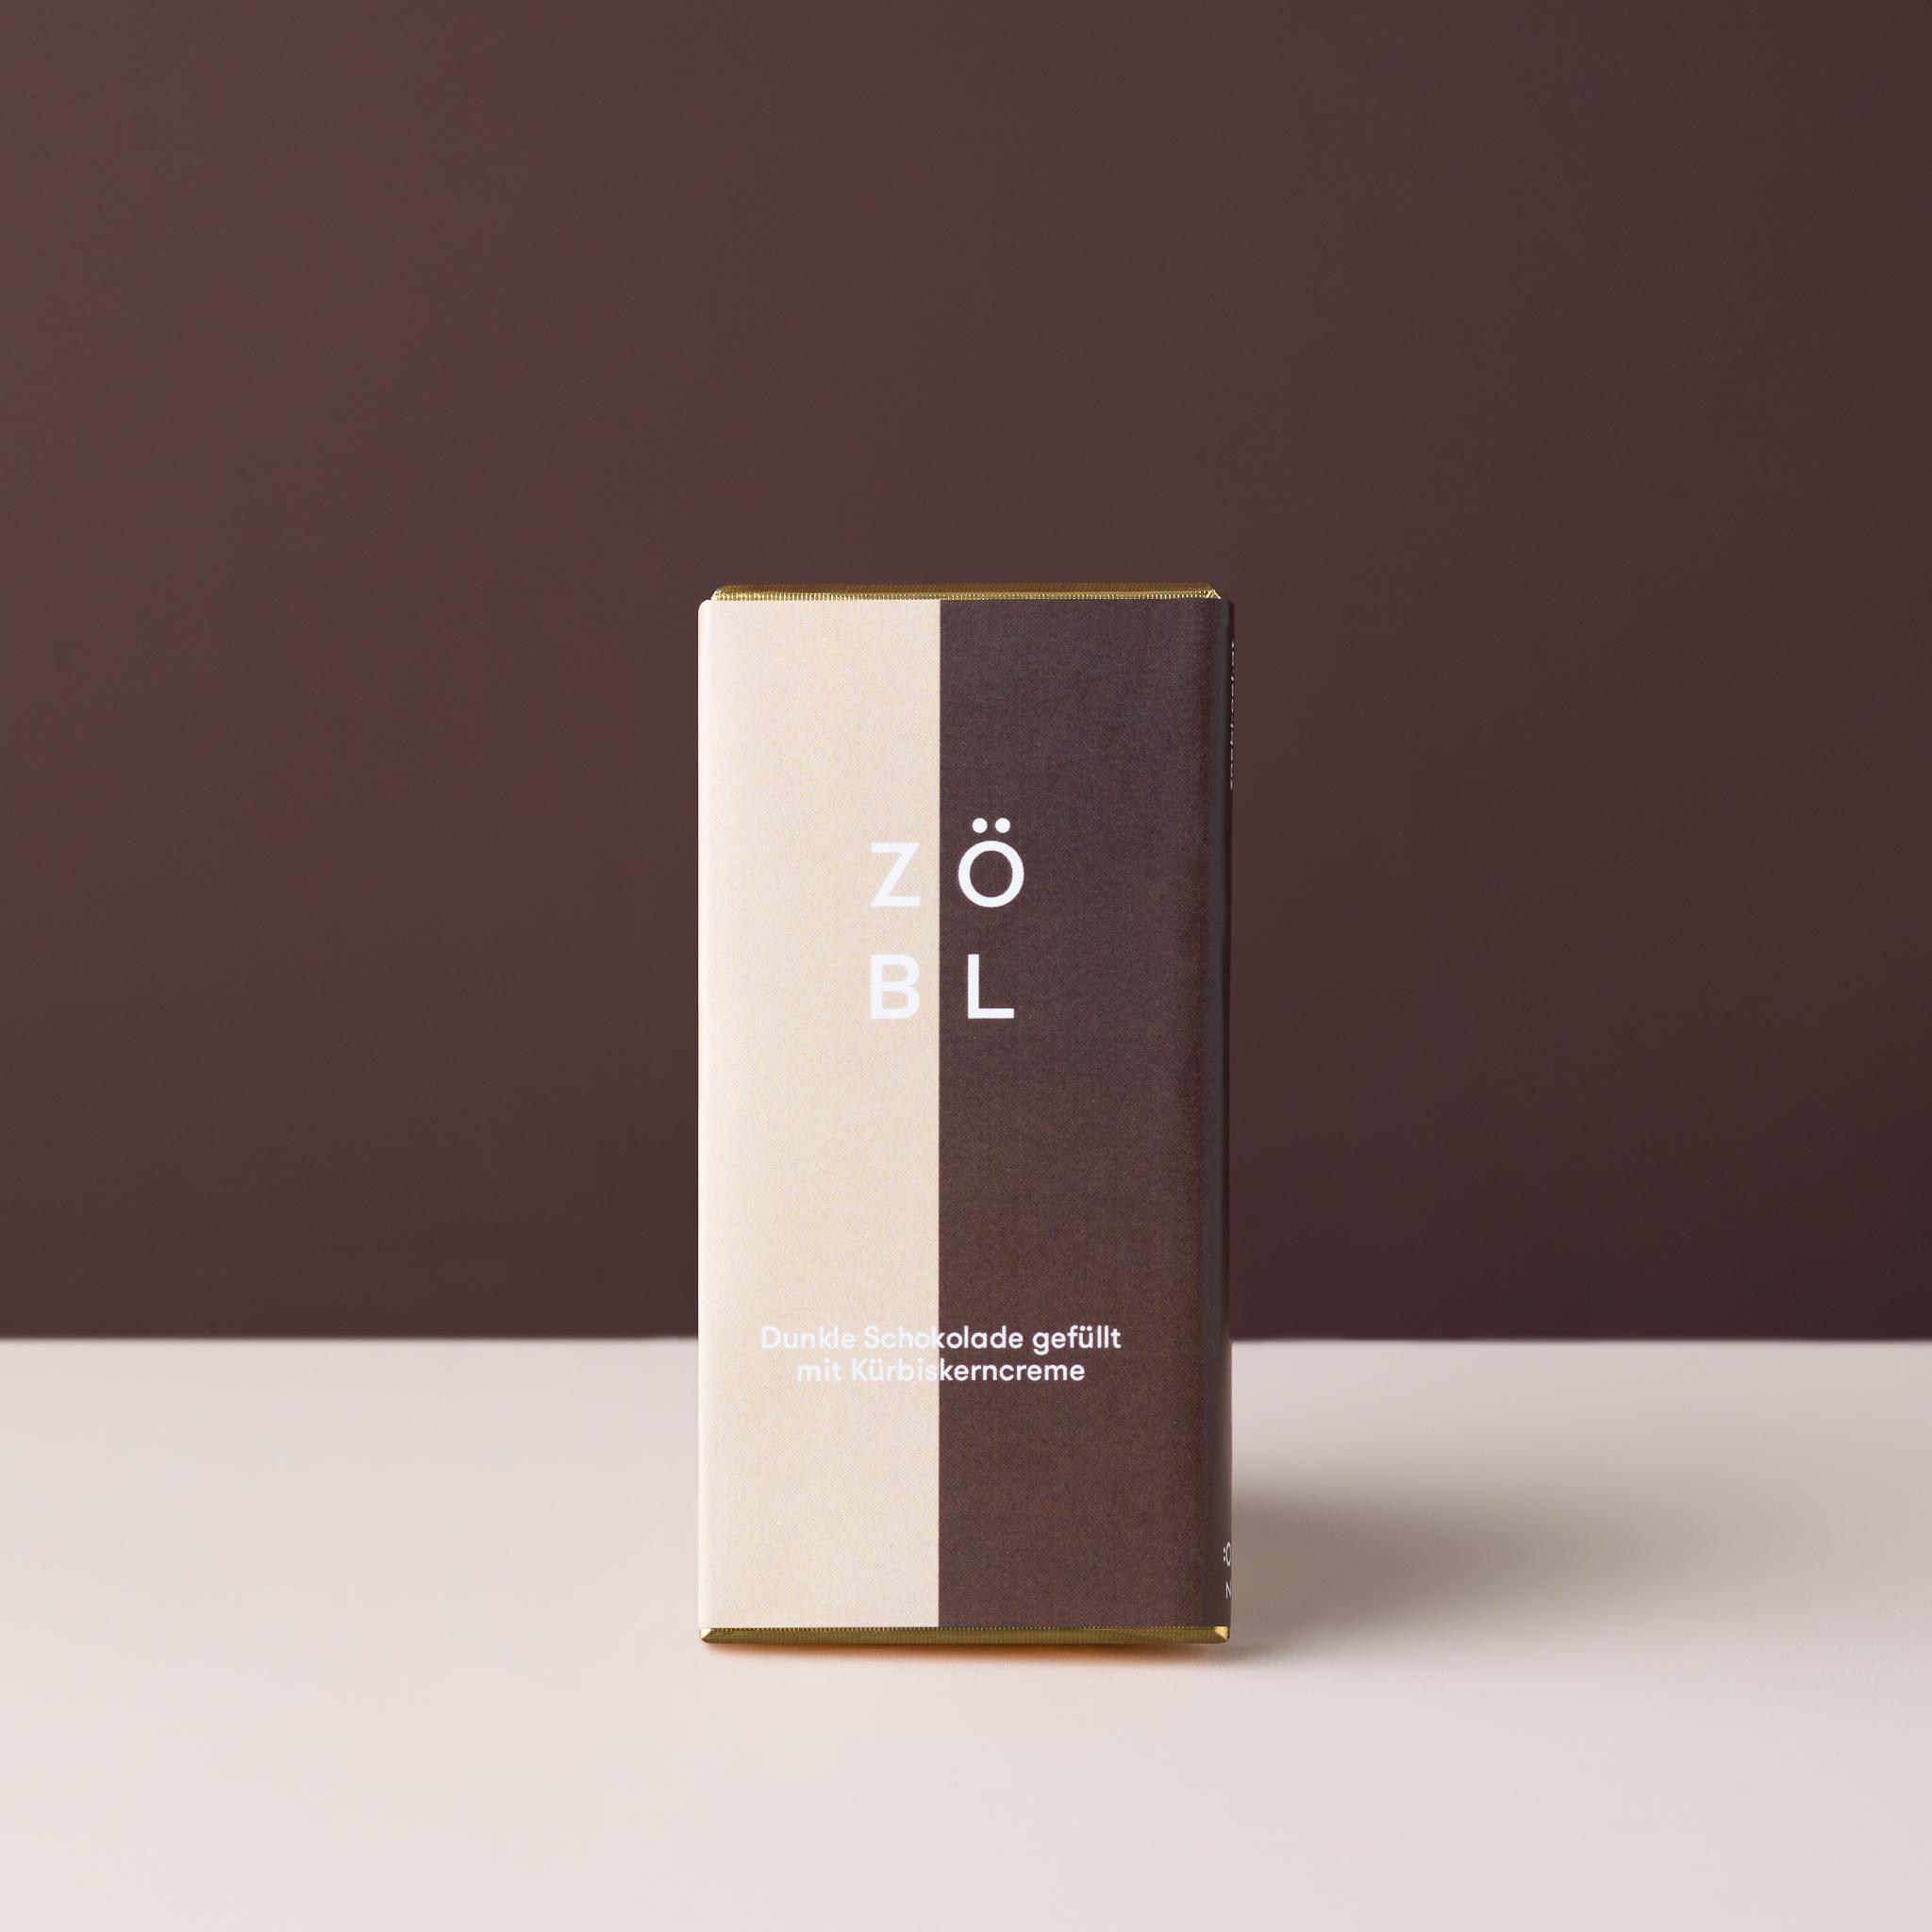 Zöbl Kernöl Produktfotografie-9